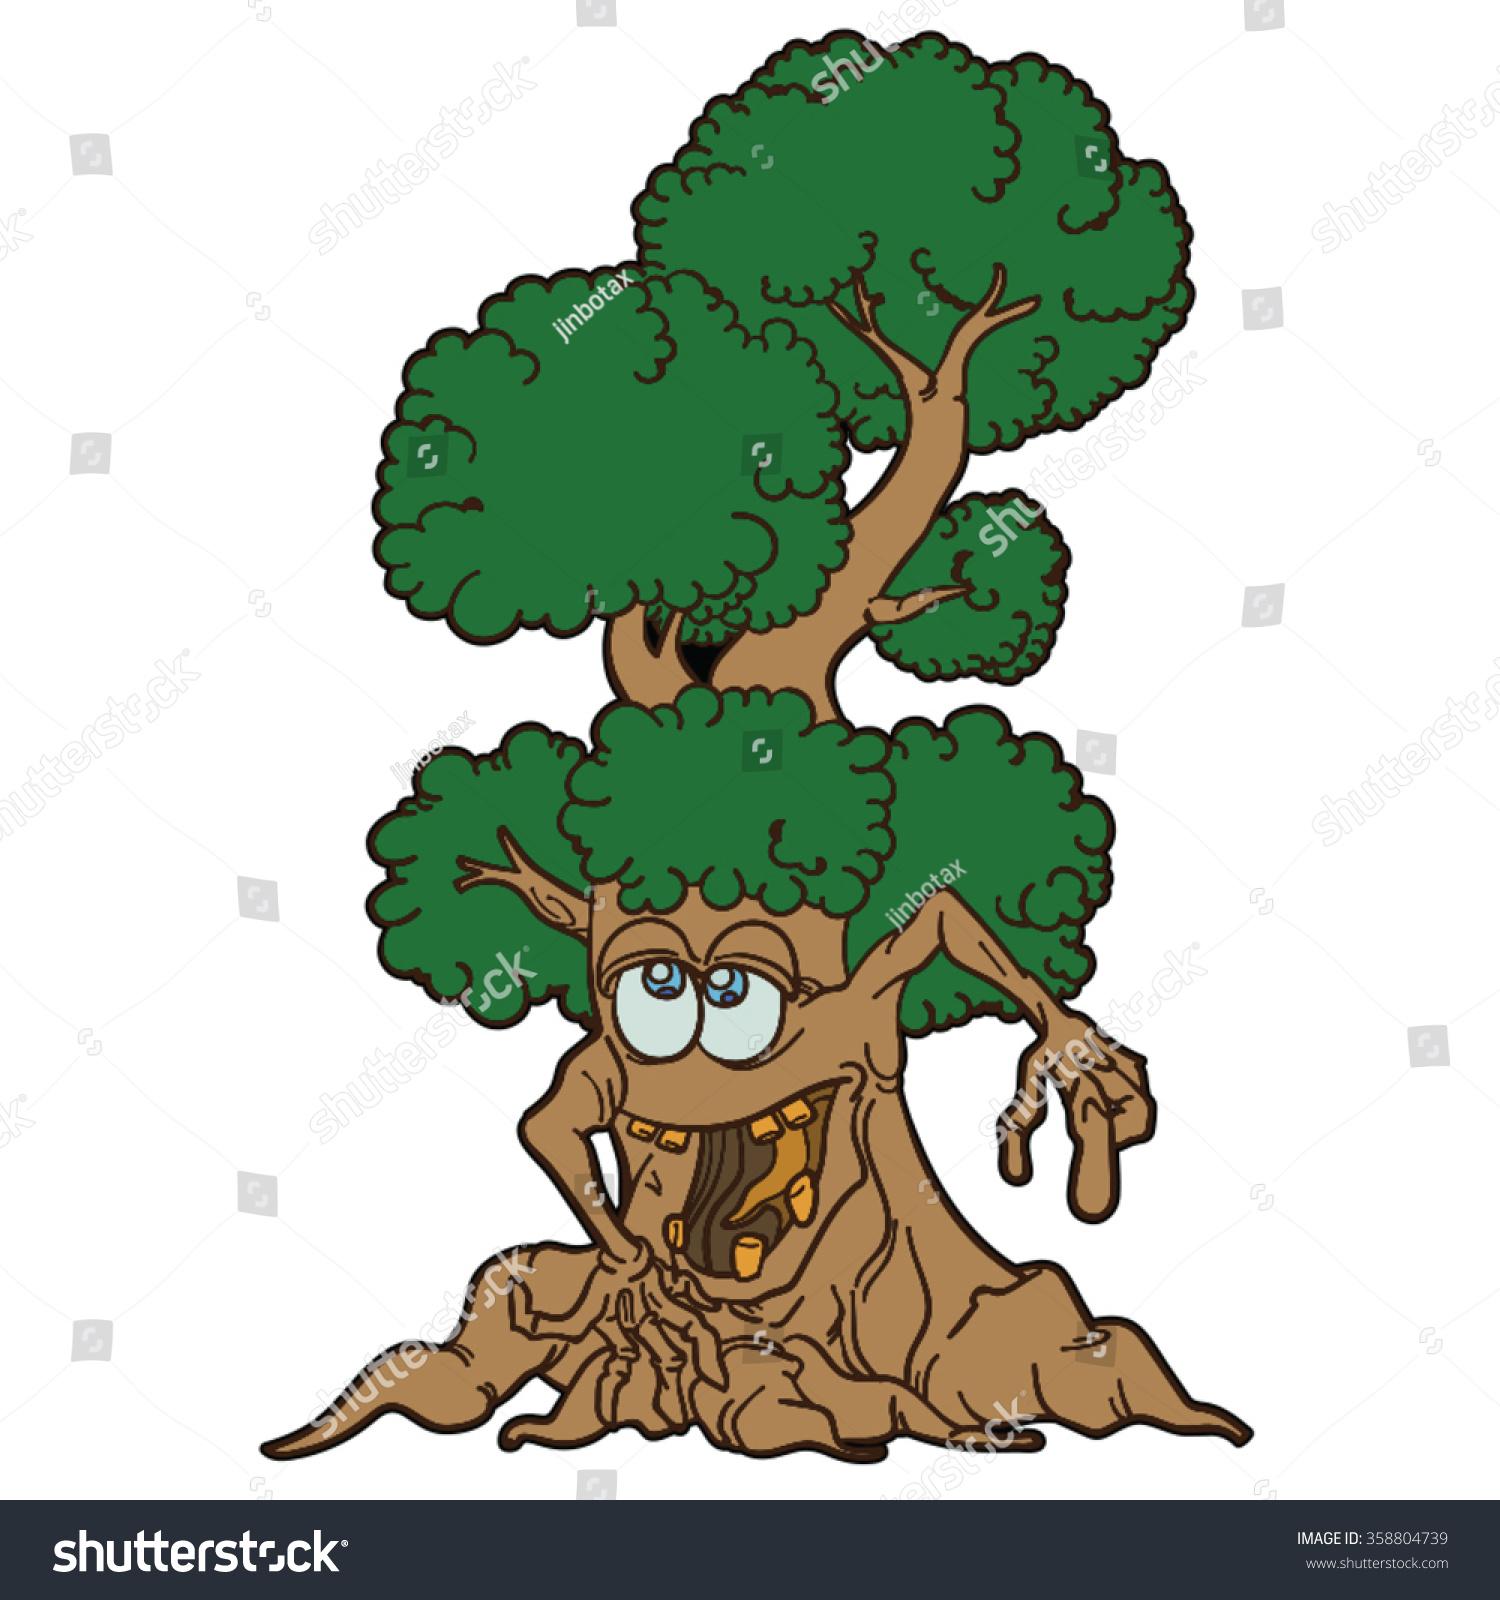 Monster Tree Cartoon Stock Vector Royalty Free 358804739 Ang god is that thorny tree monster terrifying! https www shutterstock com image vector monster tree cartoon 358804739